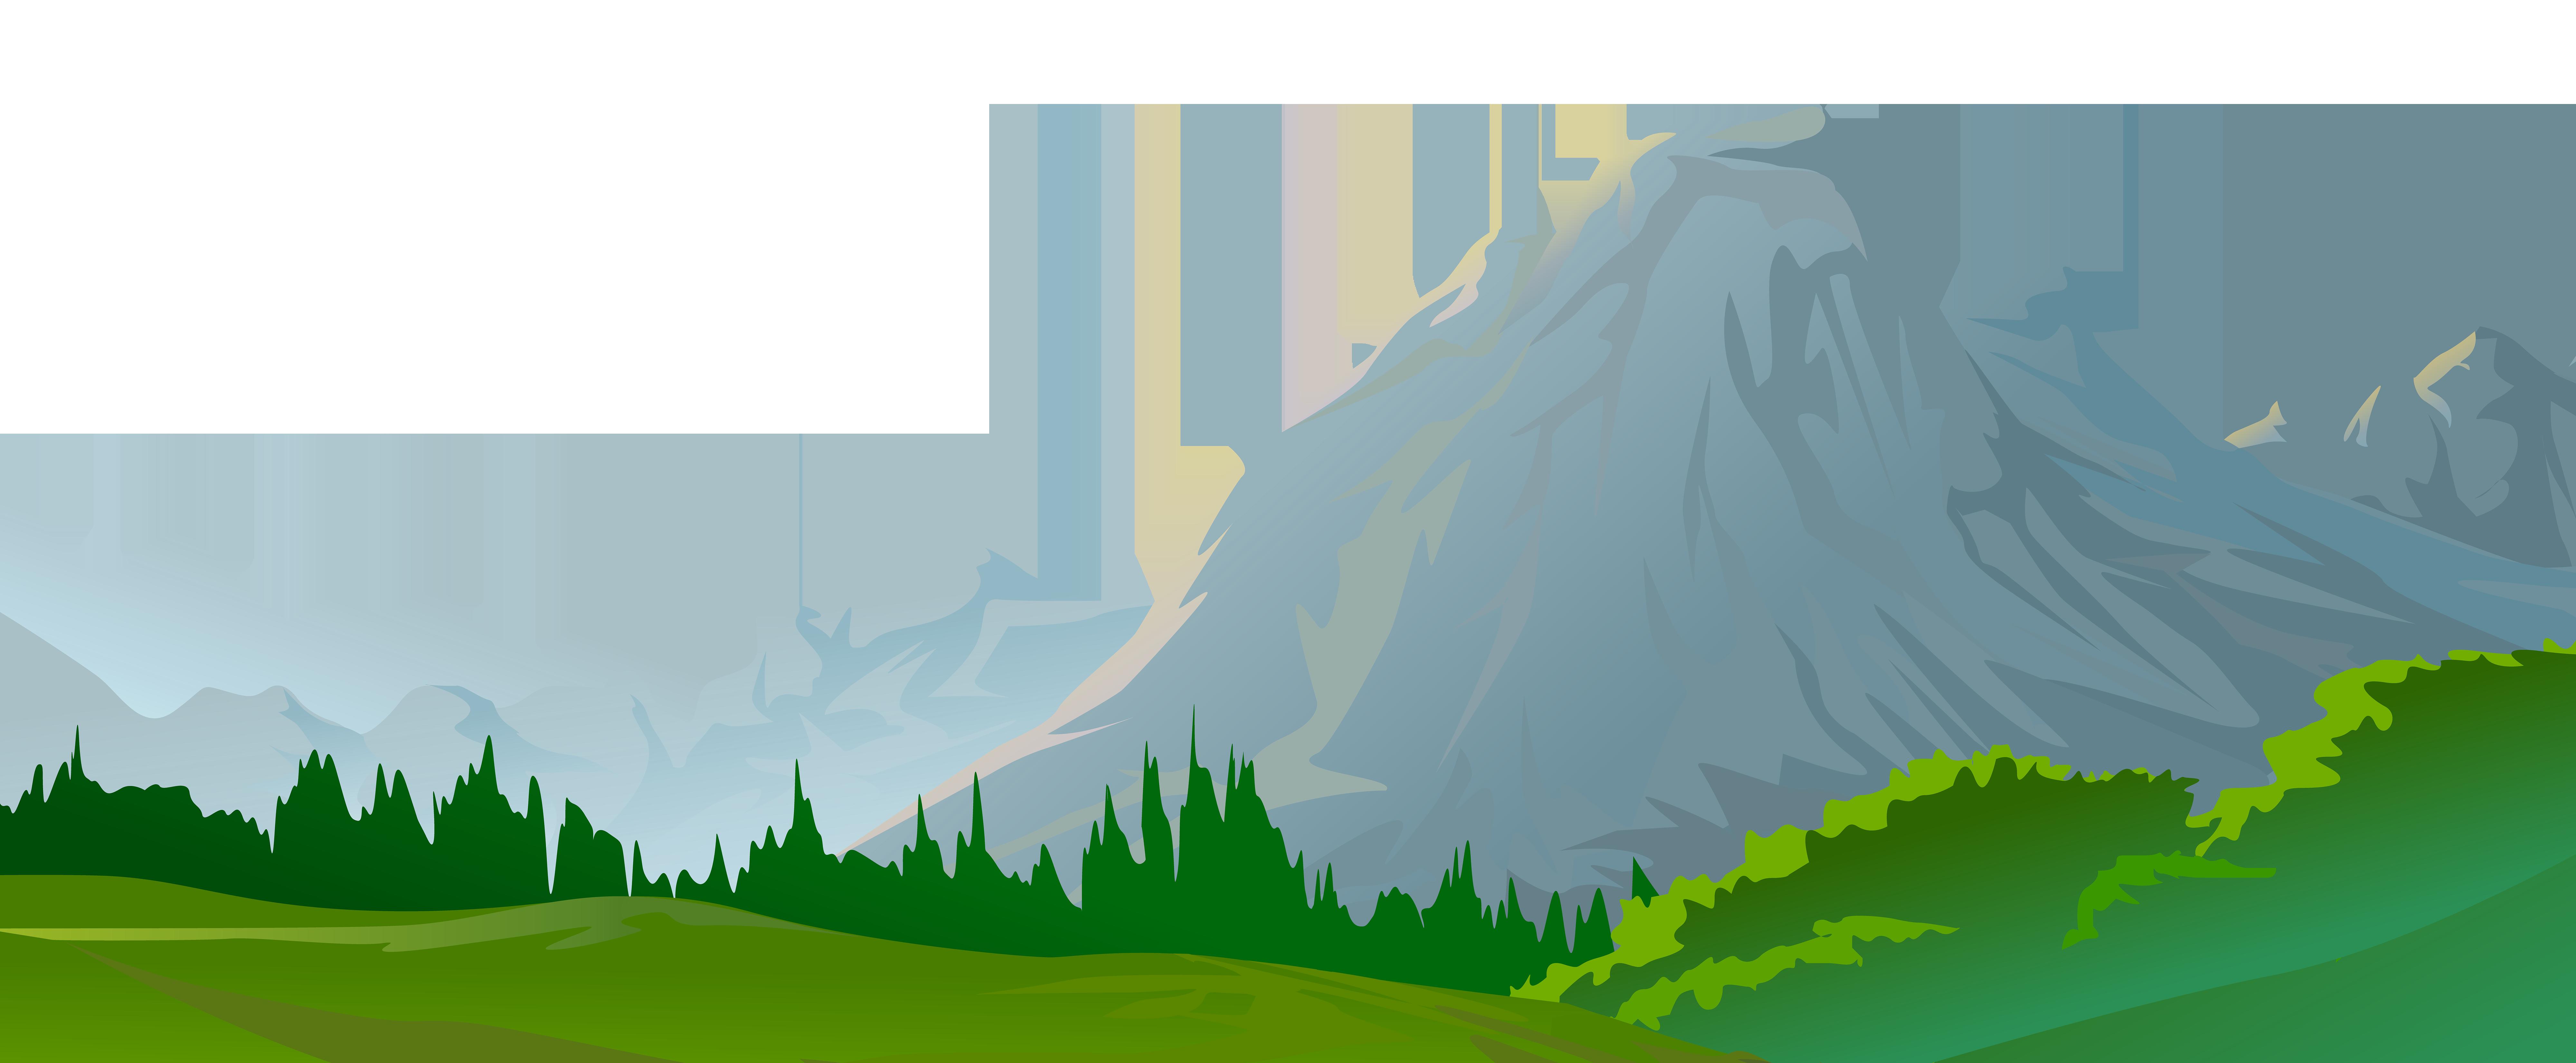 Hills mountain landform